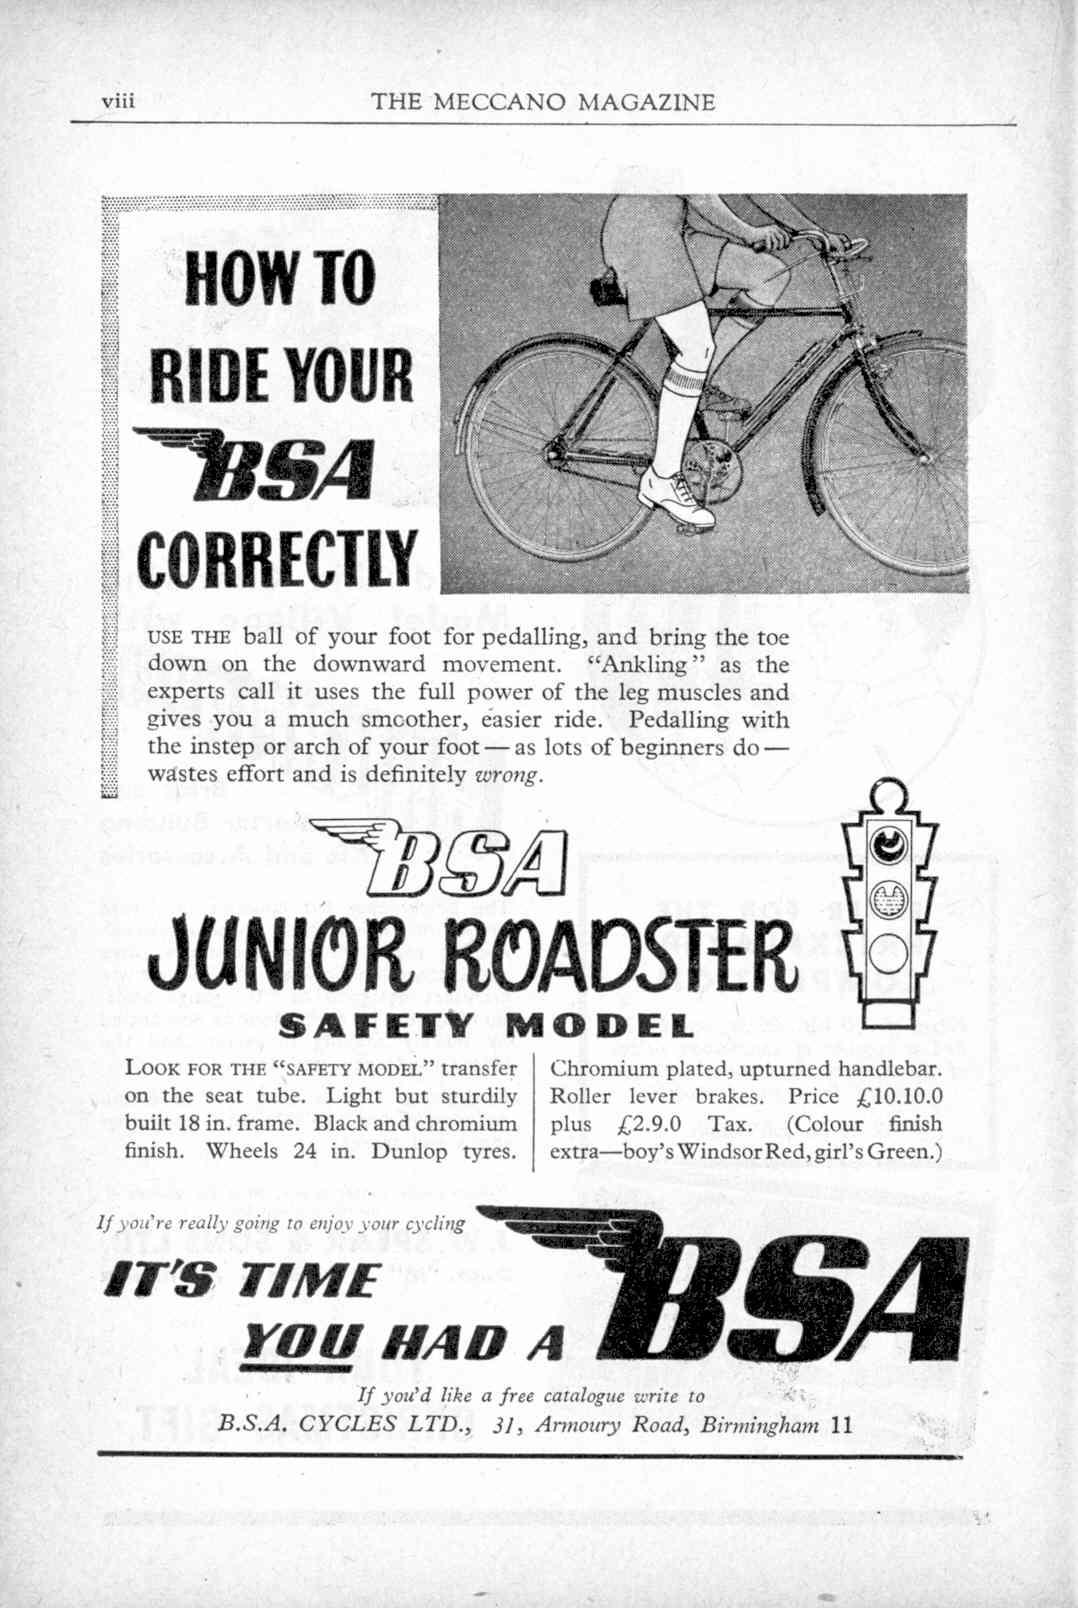 UK Meccano Magazine November 1951 Page viii